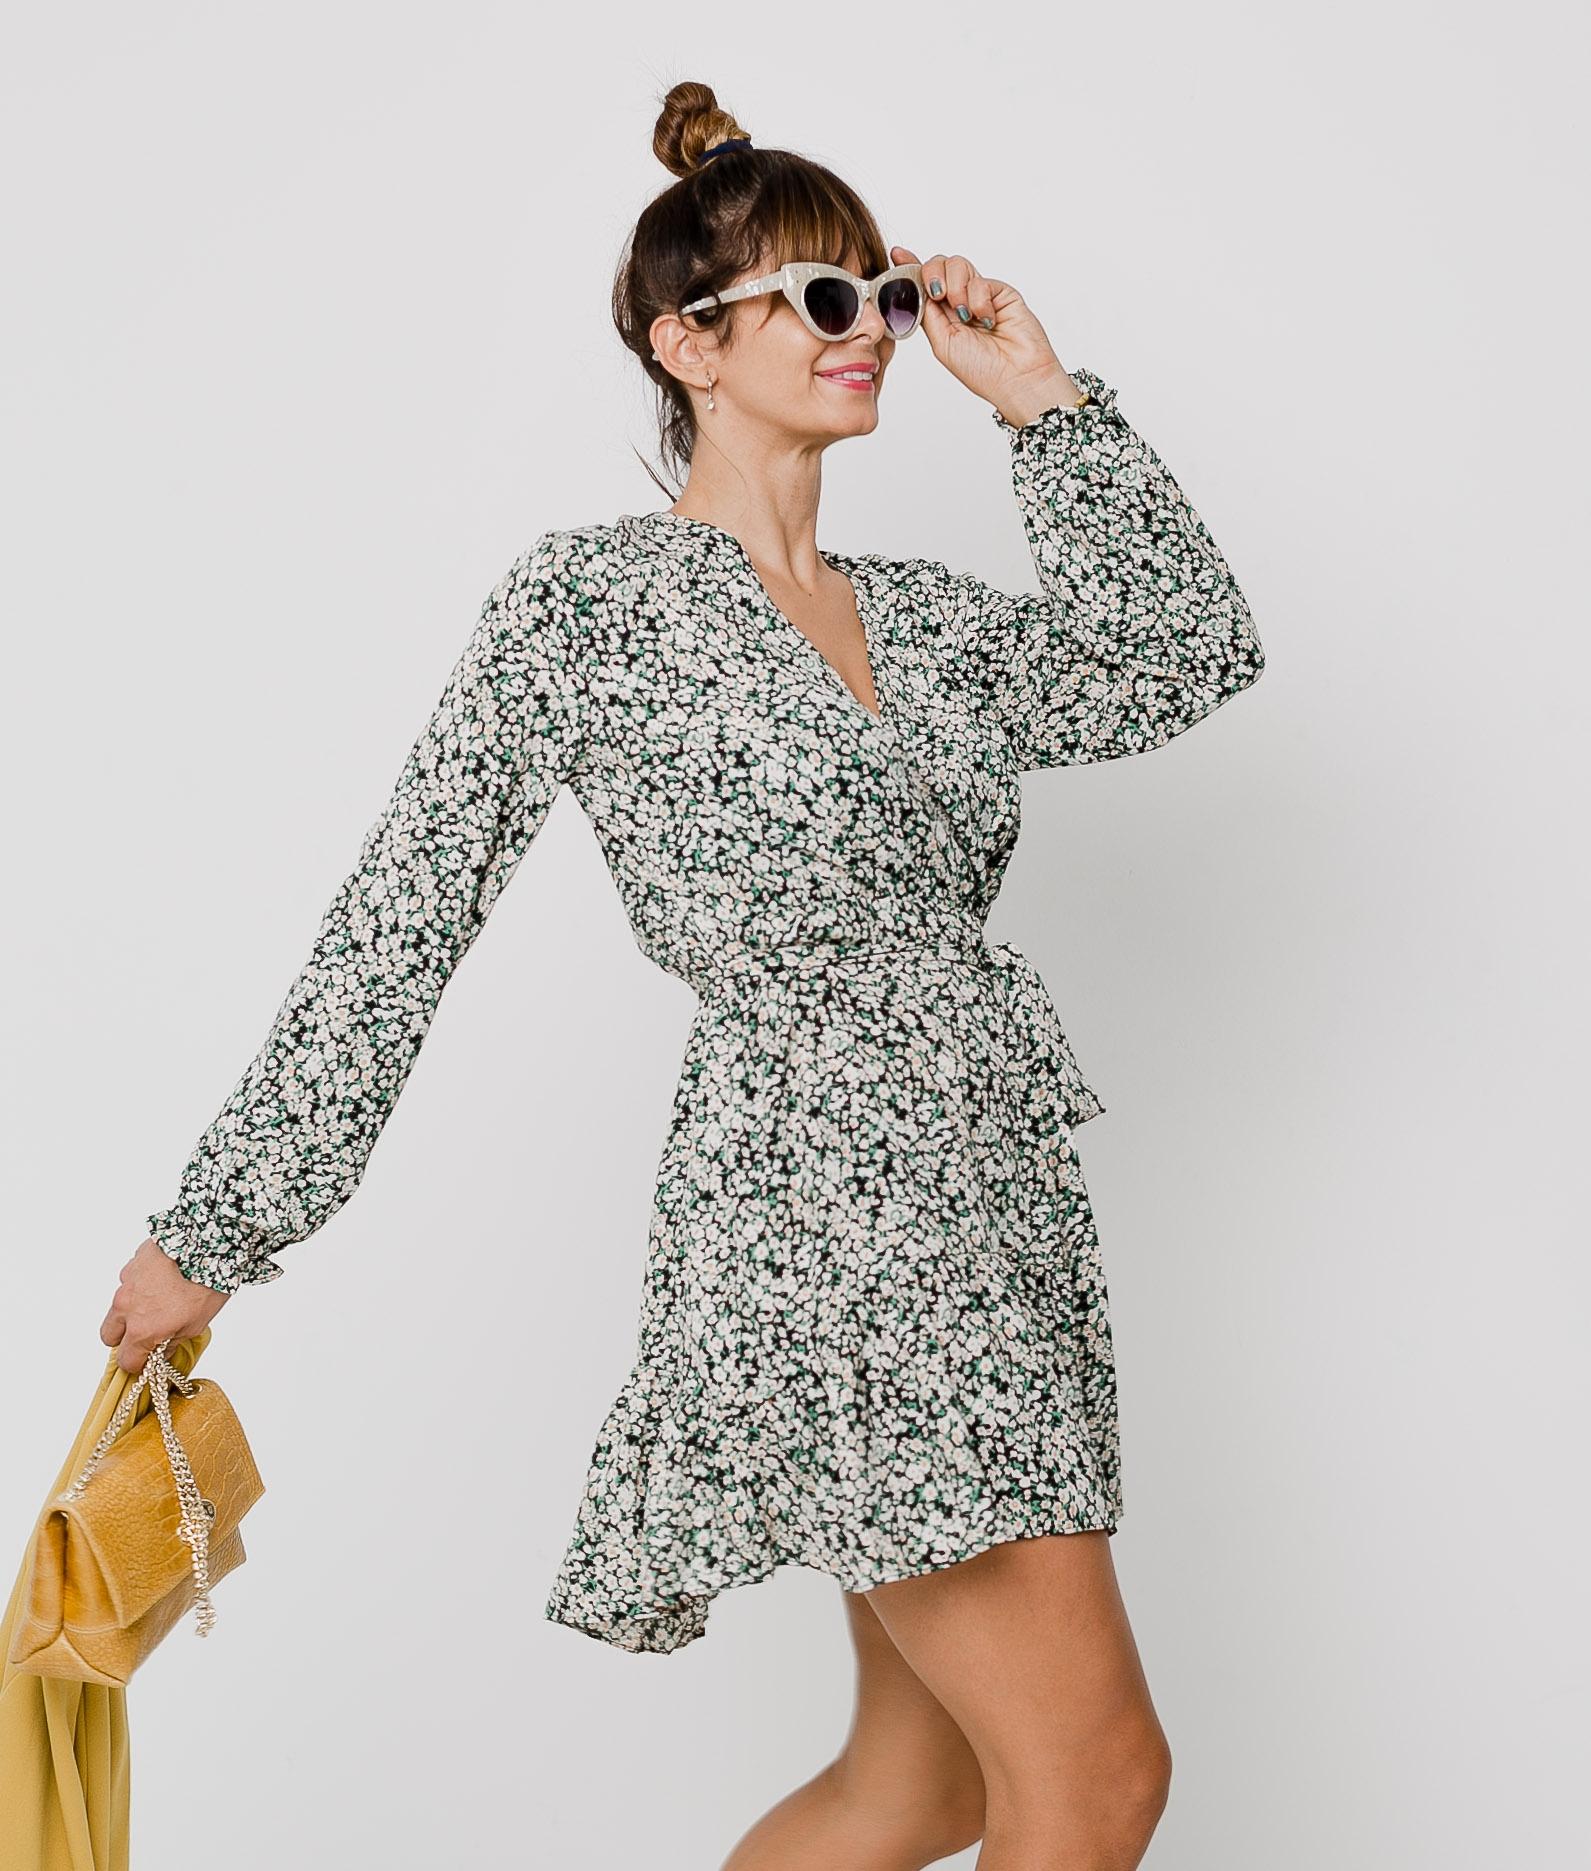 NYMERIA DRESS - GREEN